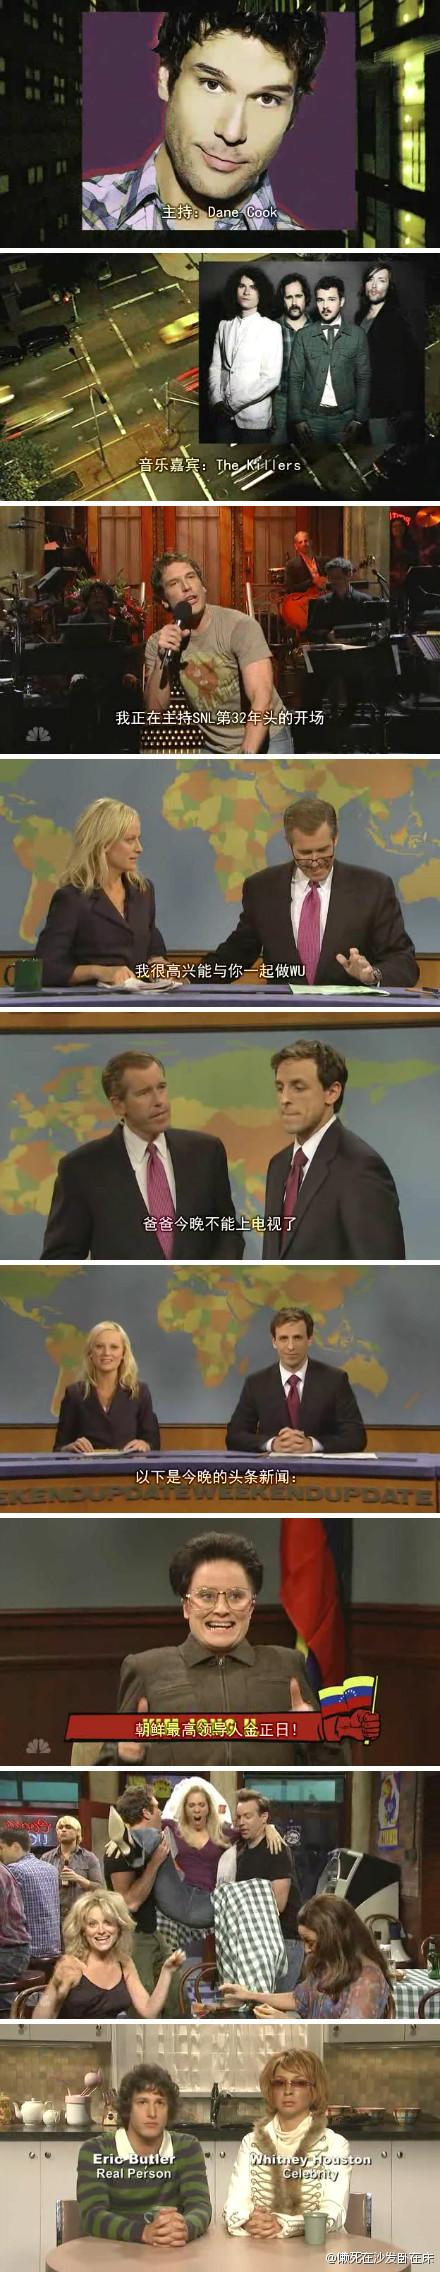 Saturday Night Live(SNL)周六夜现场 第32季首集